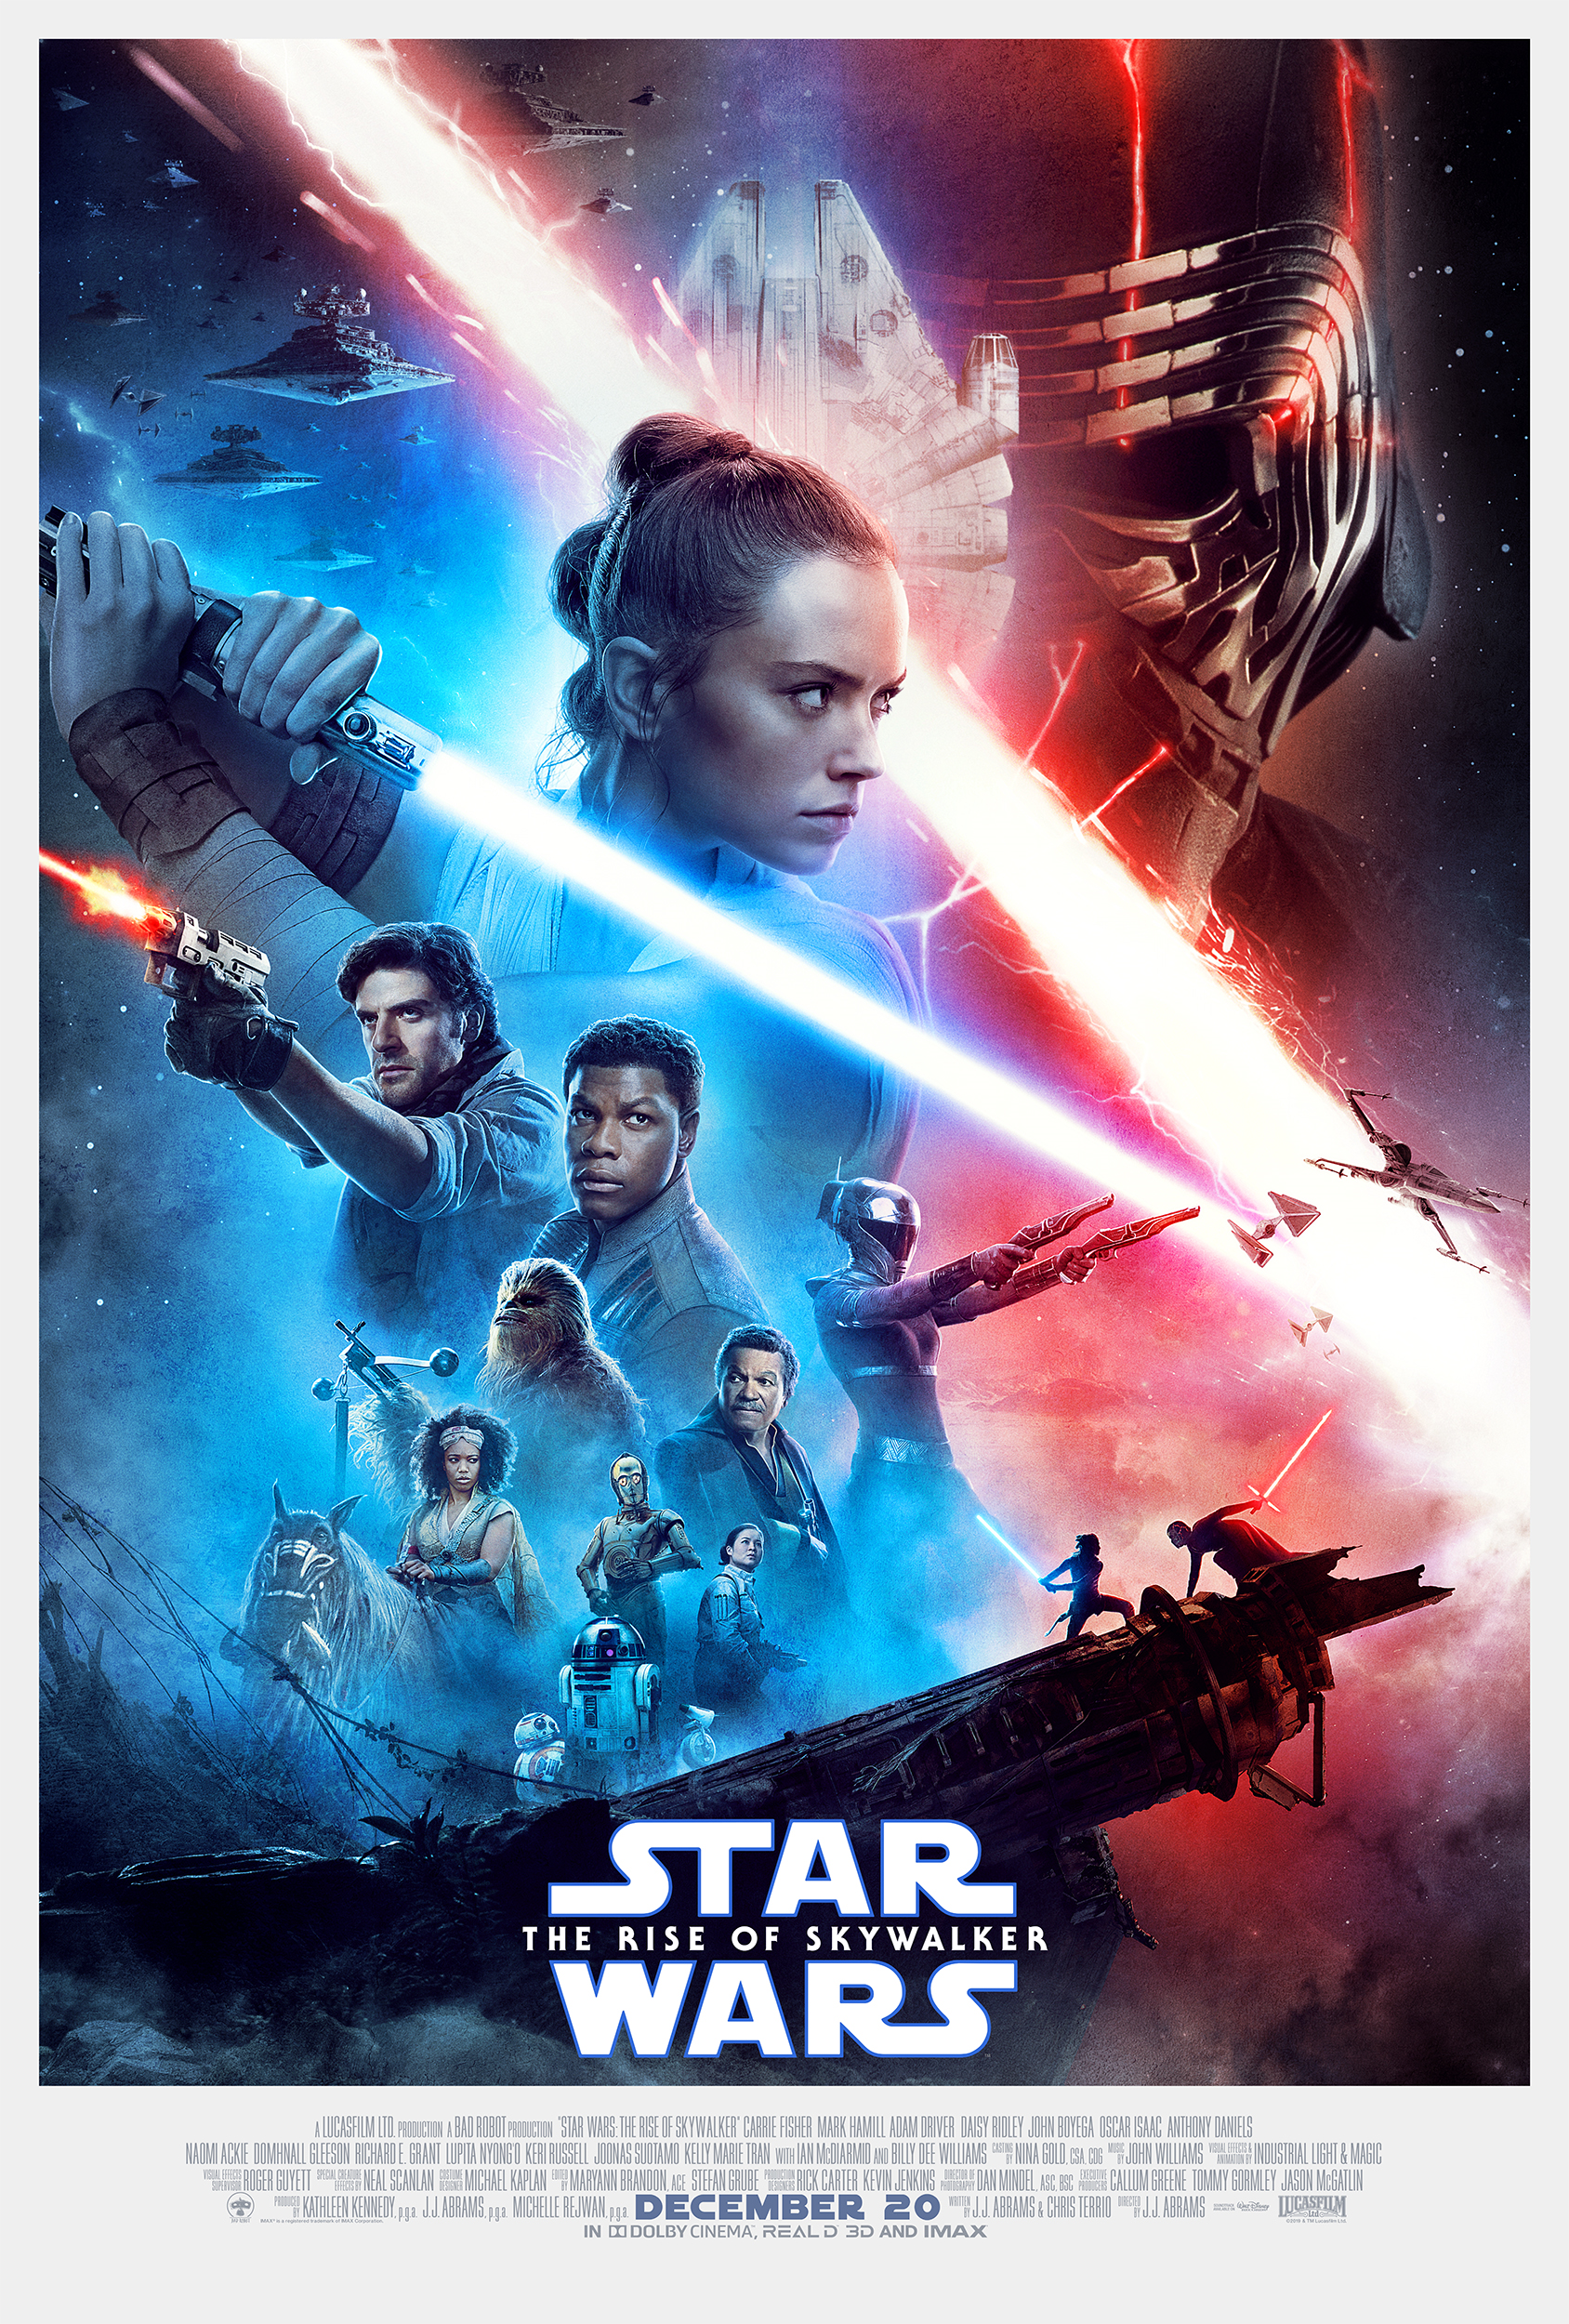 Star Wars Episode IX – The Rise of Skywalker